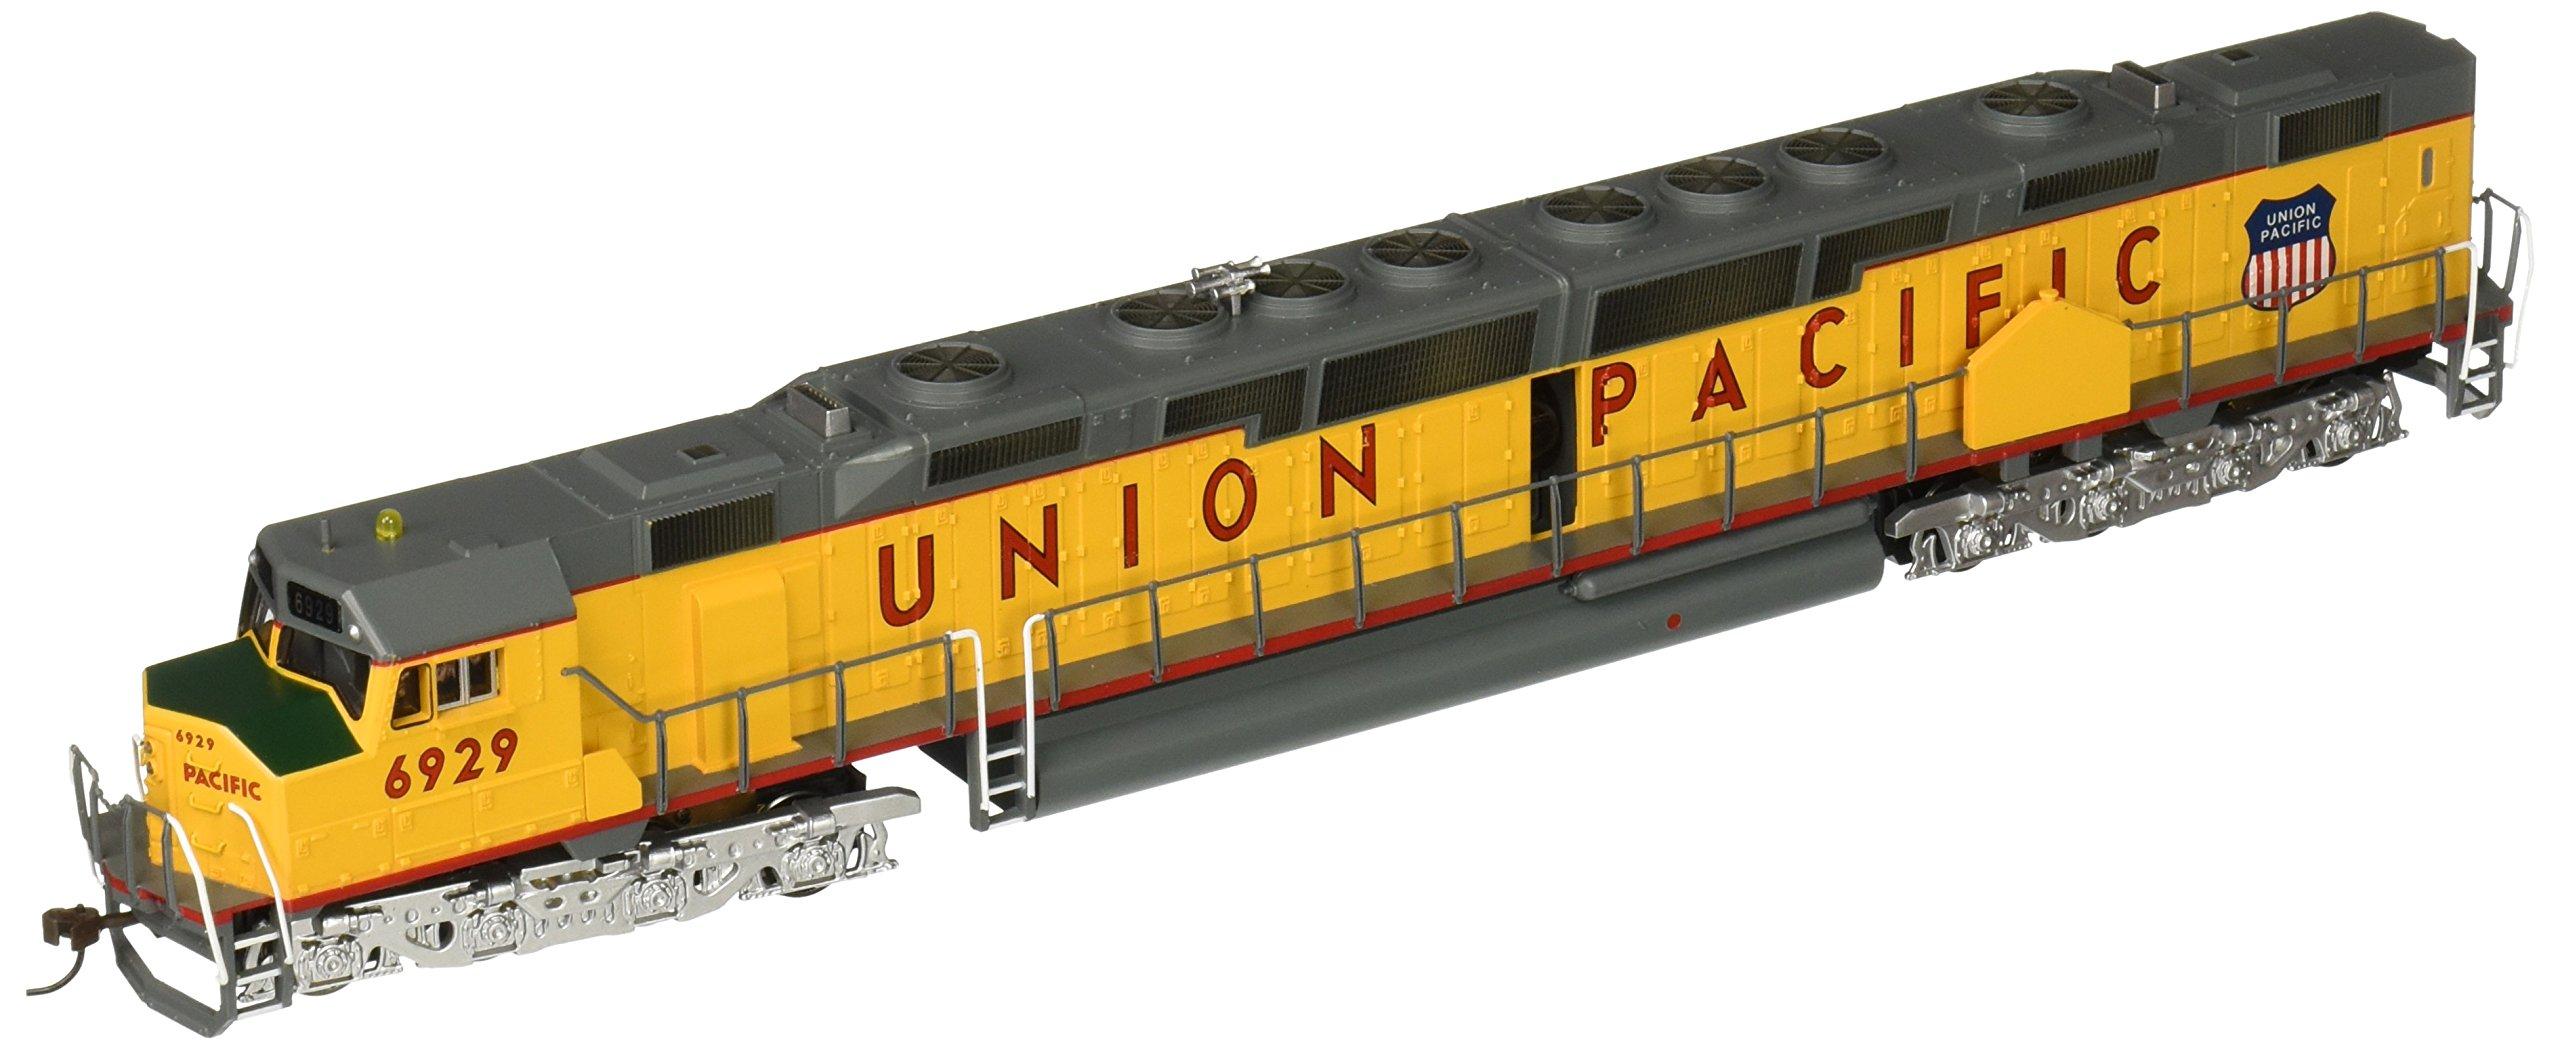 Bachmann Industries Union Pacific #6929 EMD DD40 AX Centennial Diesel Locomotive